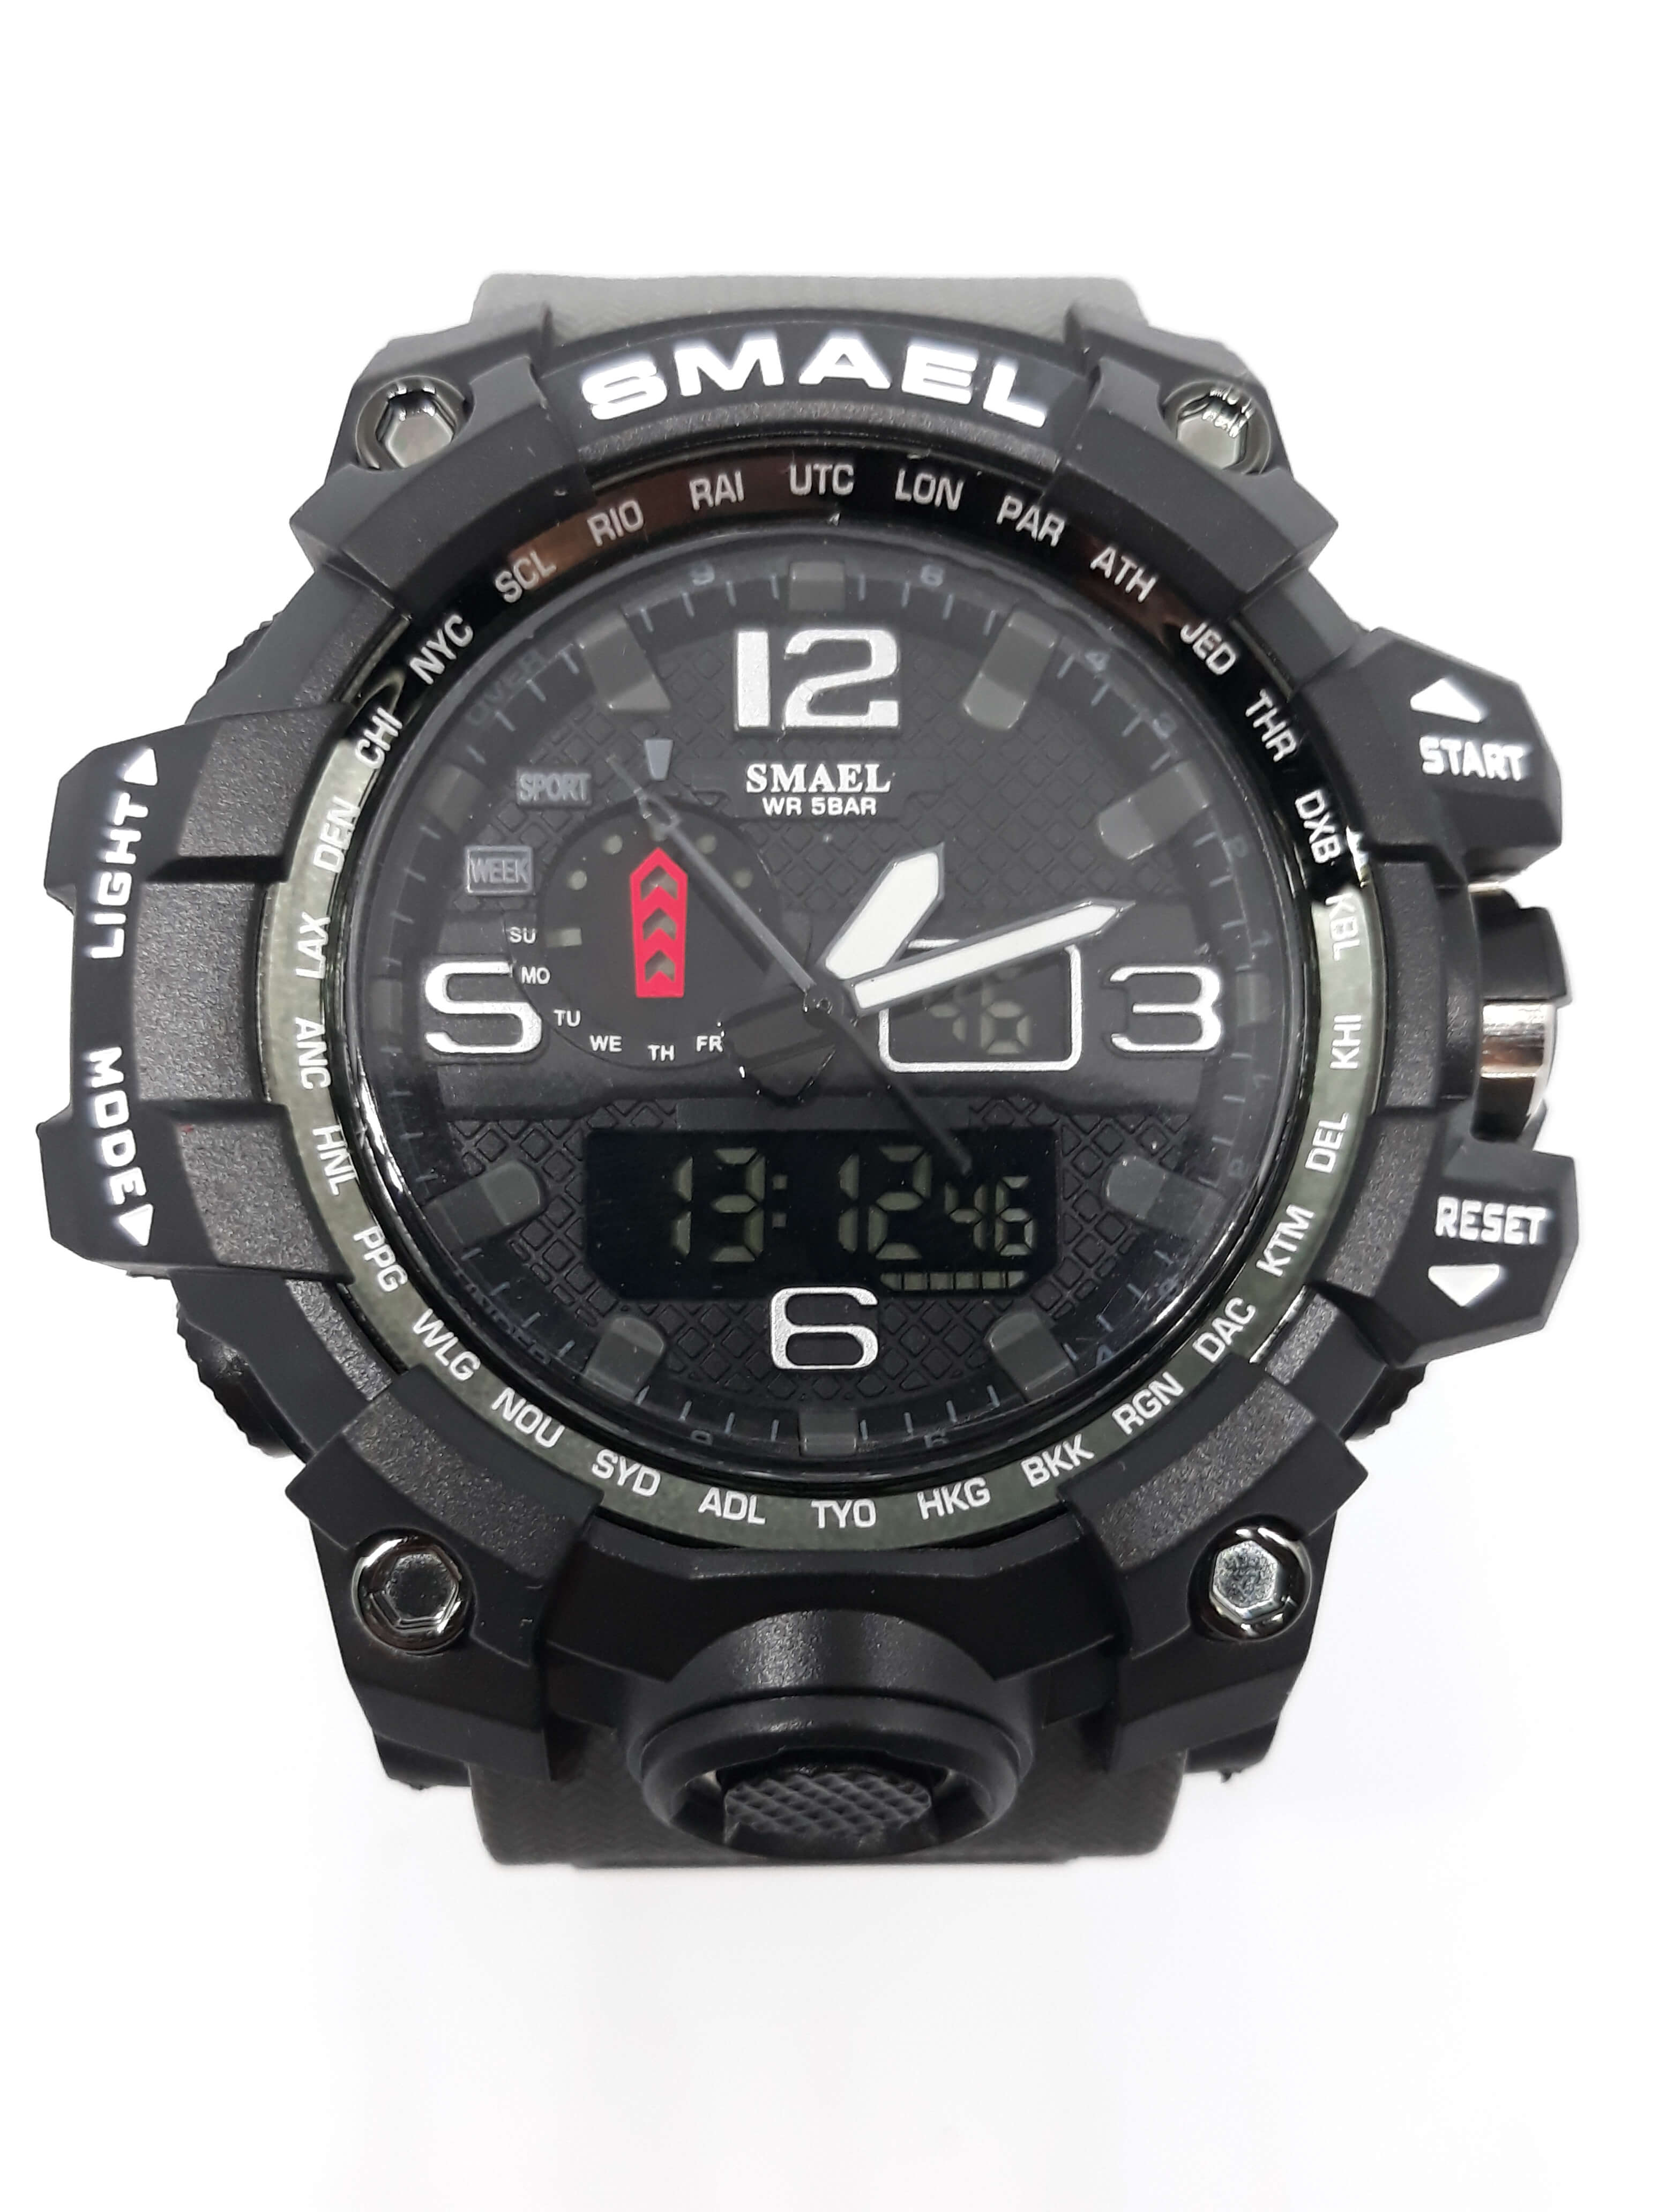 Zegarek Smael Camouflage szary 9